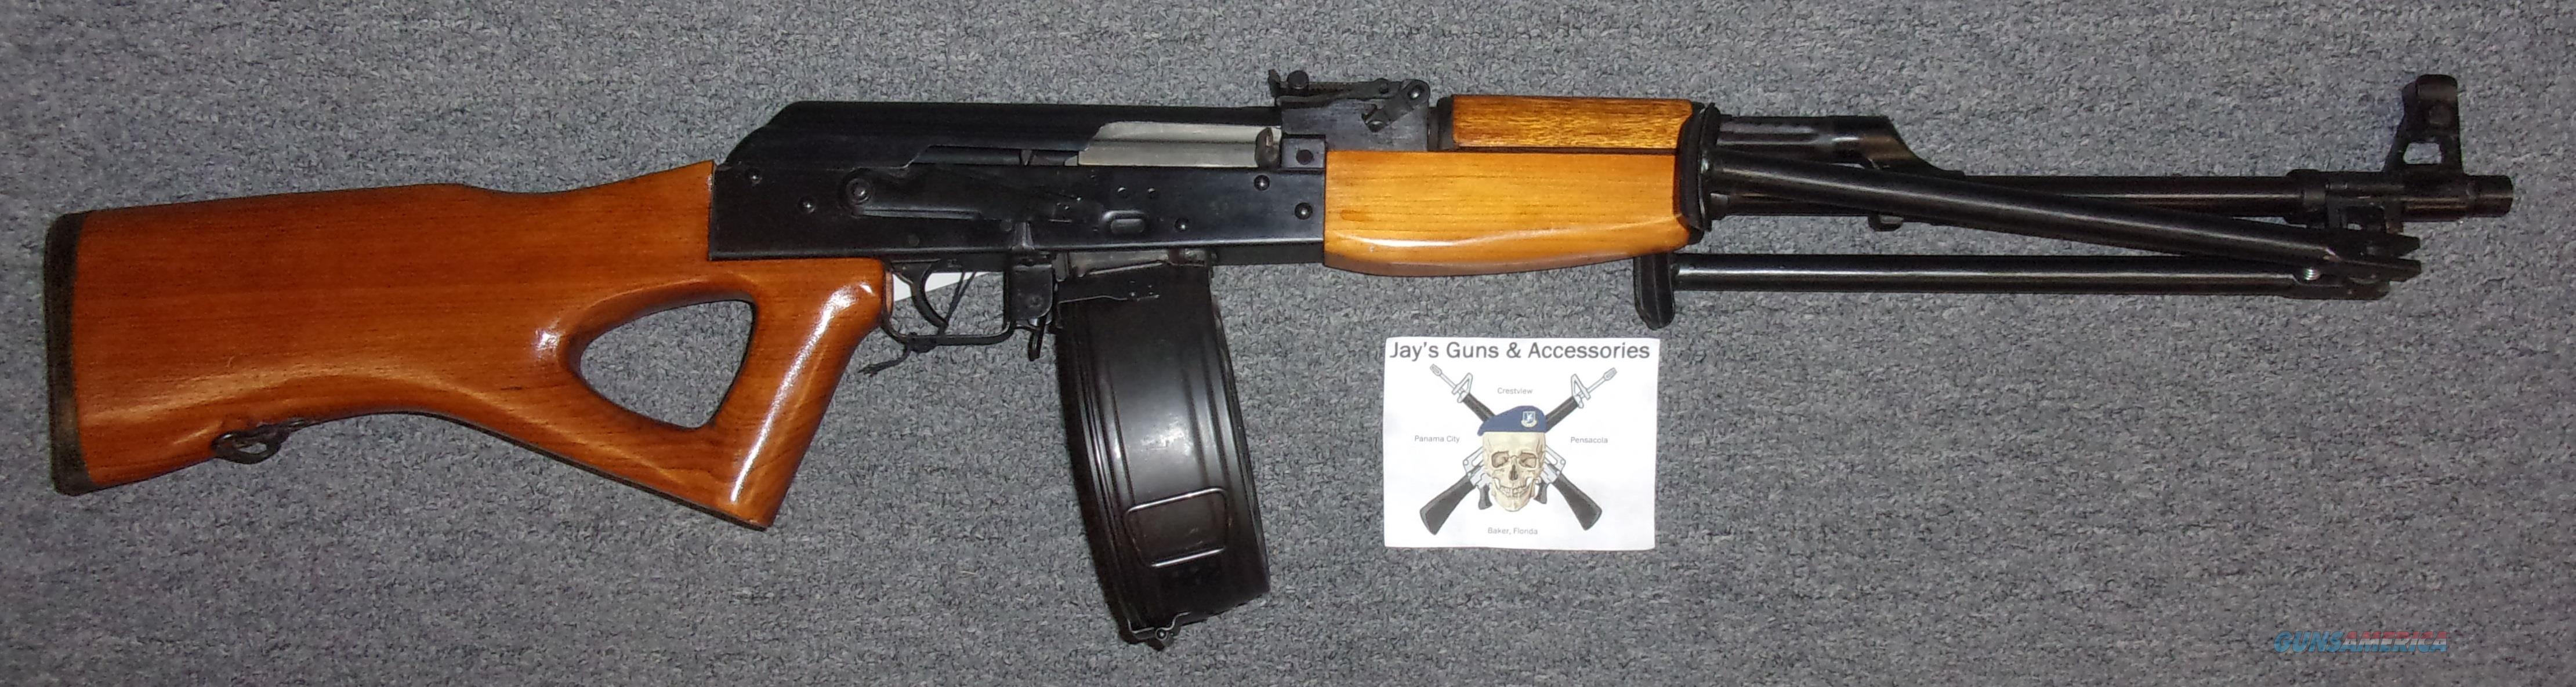 Norinco NHM 91 (Pre-Ban)  Guns > Rifles > Norinco Rifles